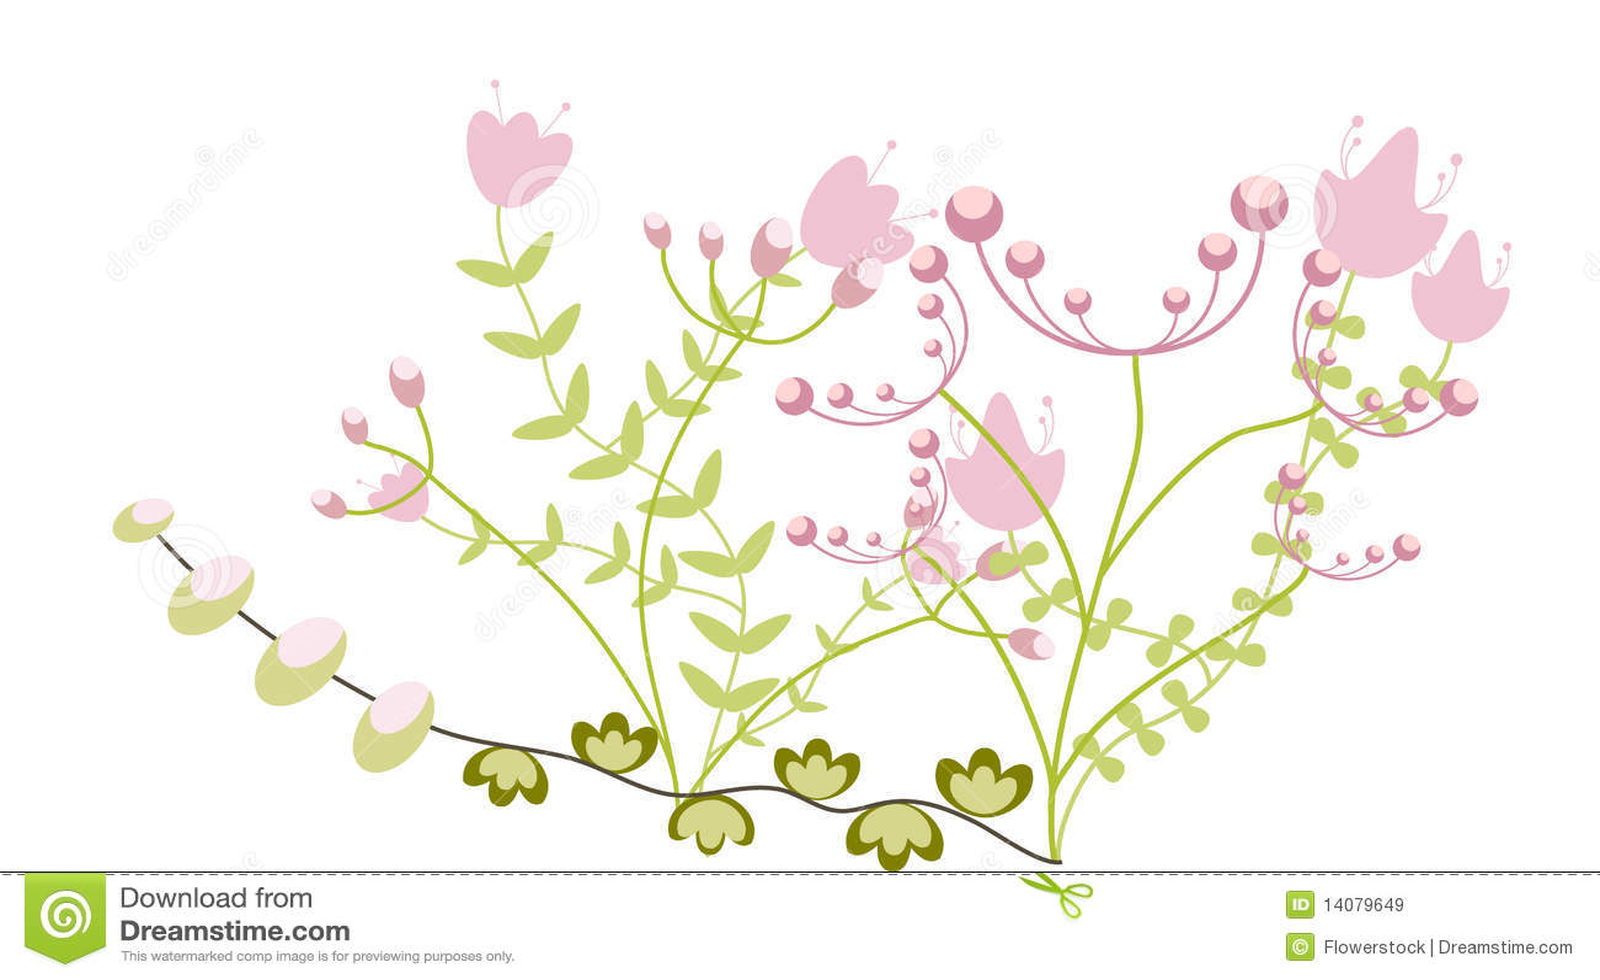 Imagens De Cumprimento: Cumprimento Floral Infantil Ilustração Stock